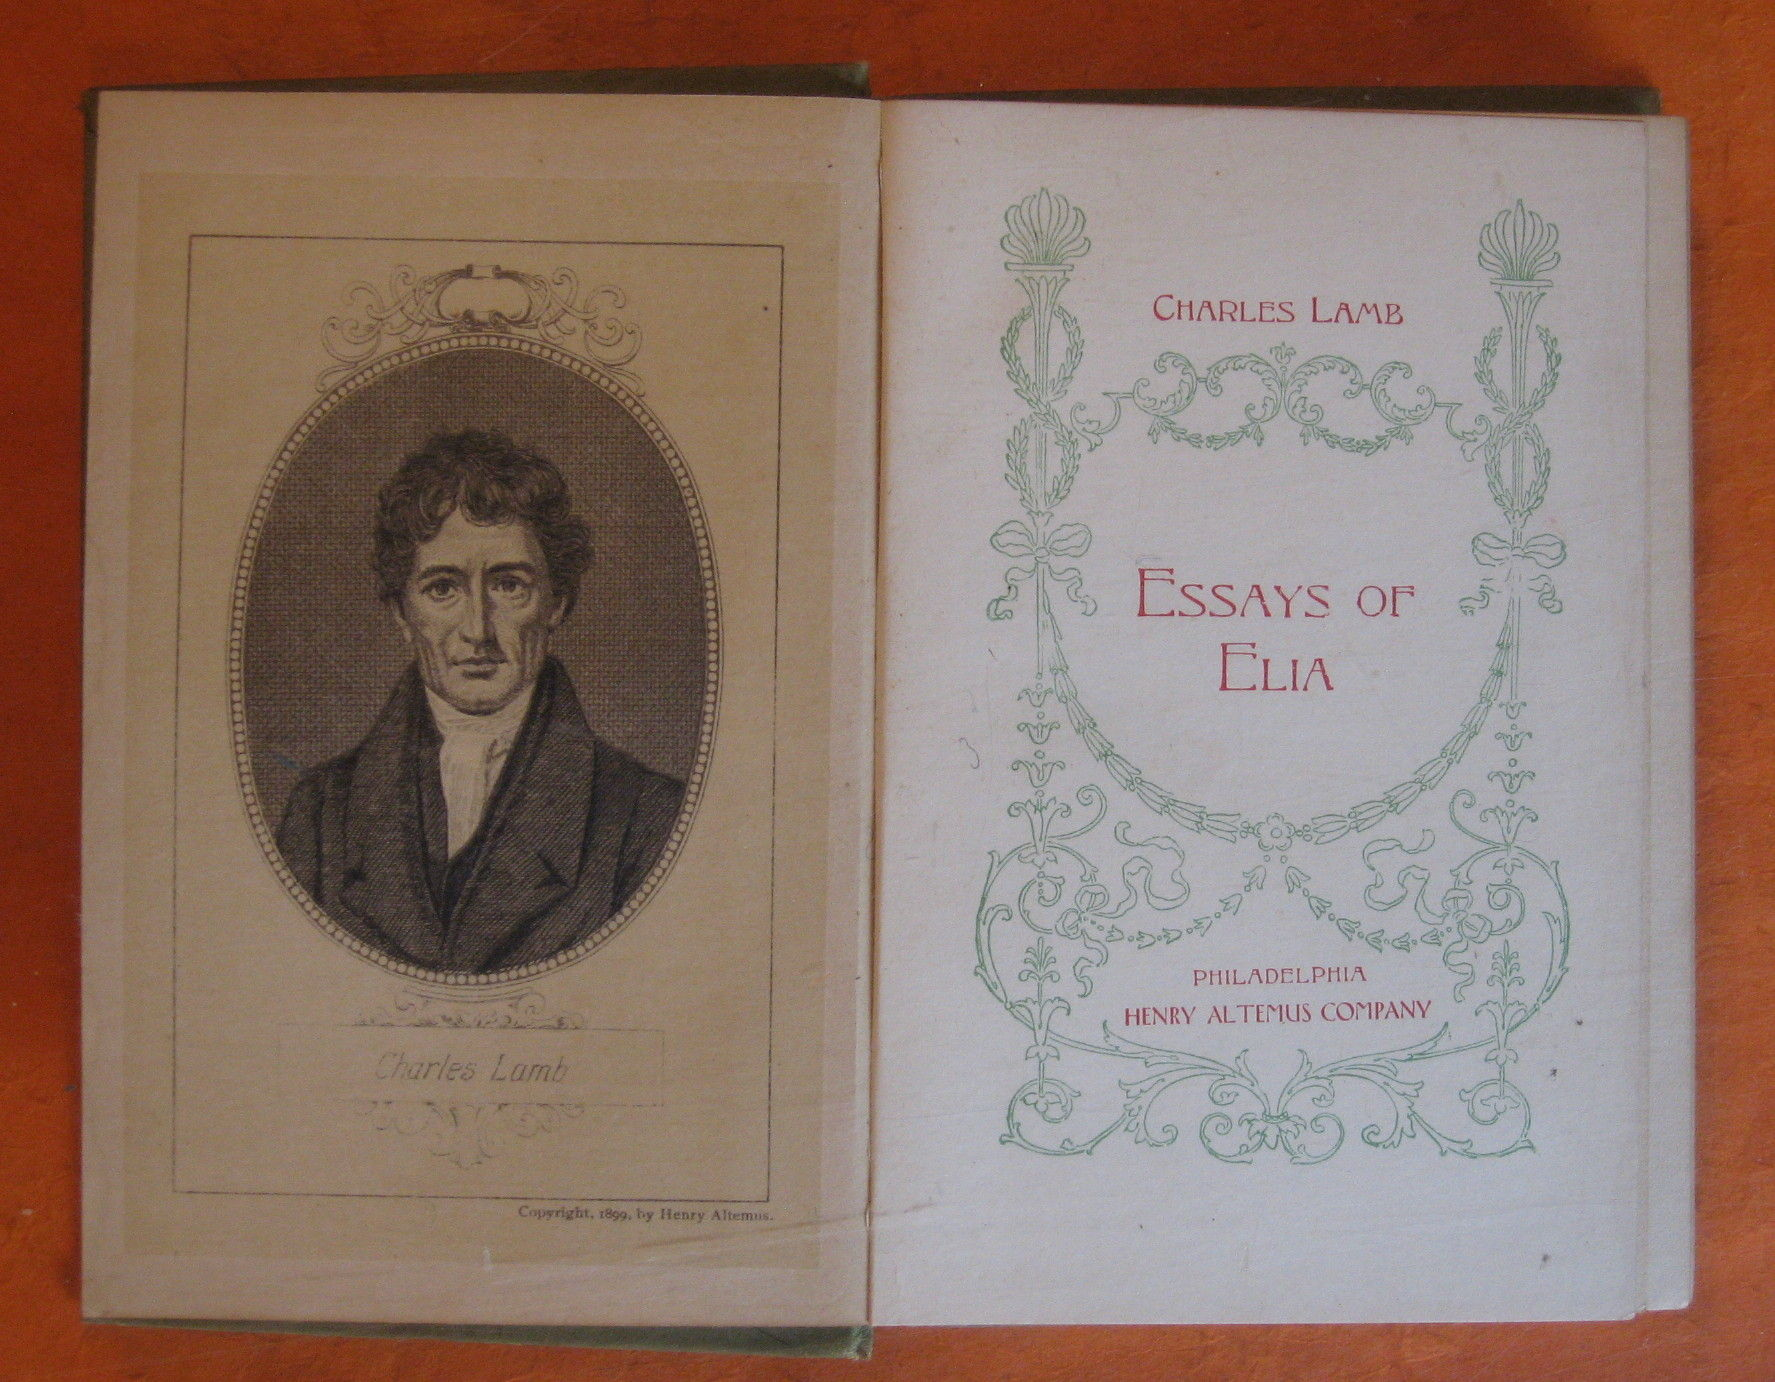 Essayist elia lived how to write a purpose for science fair